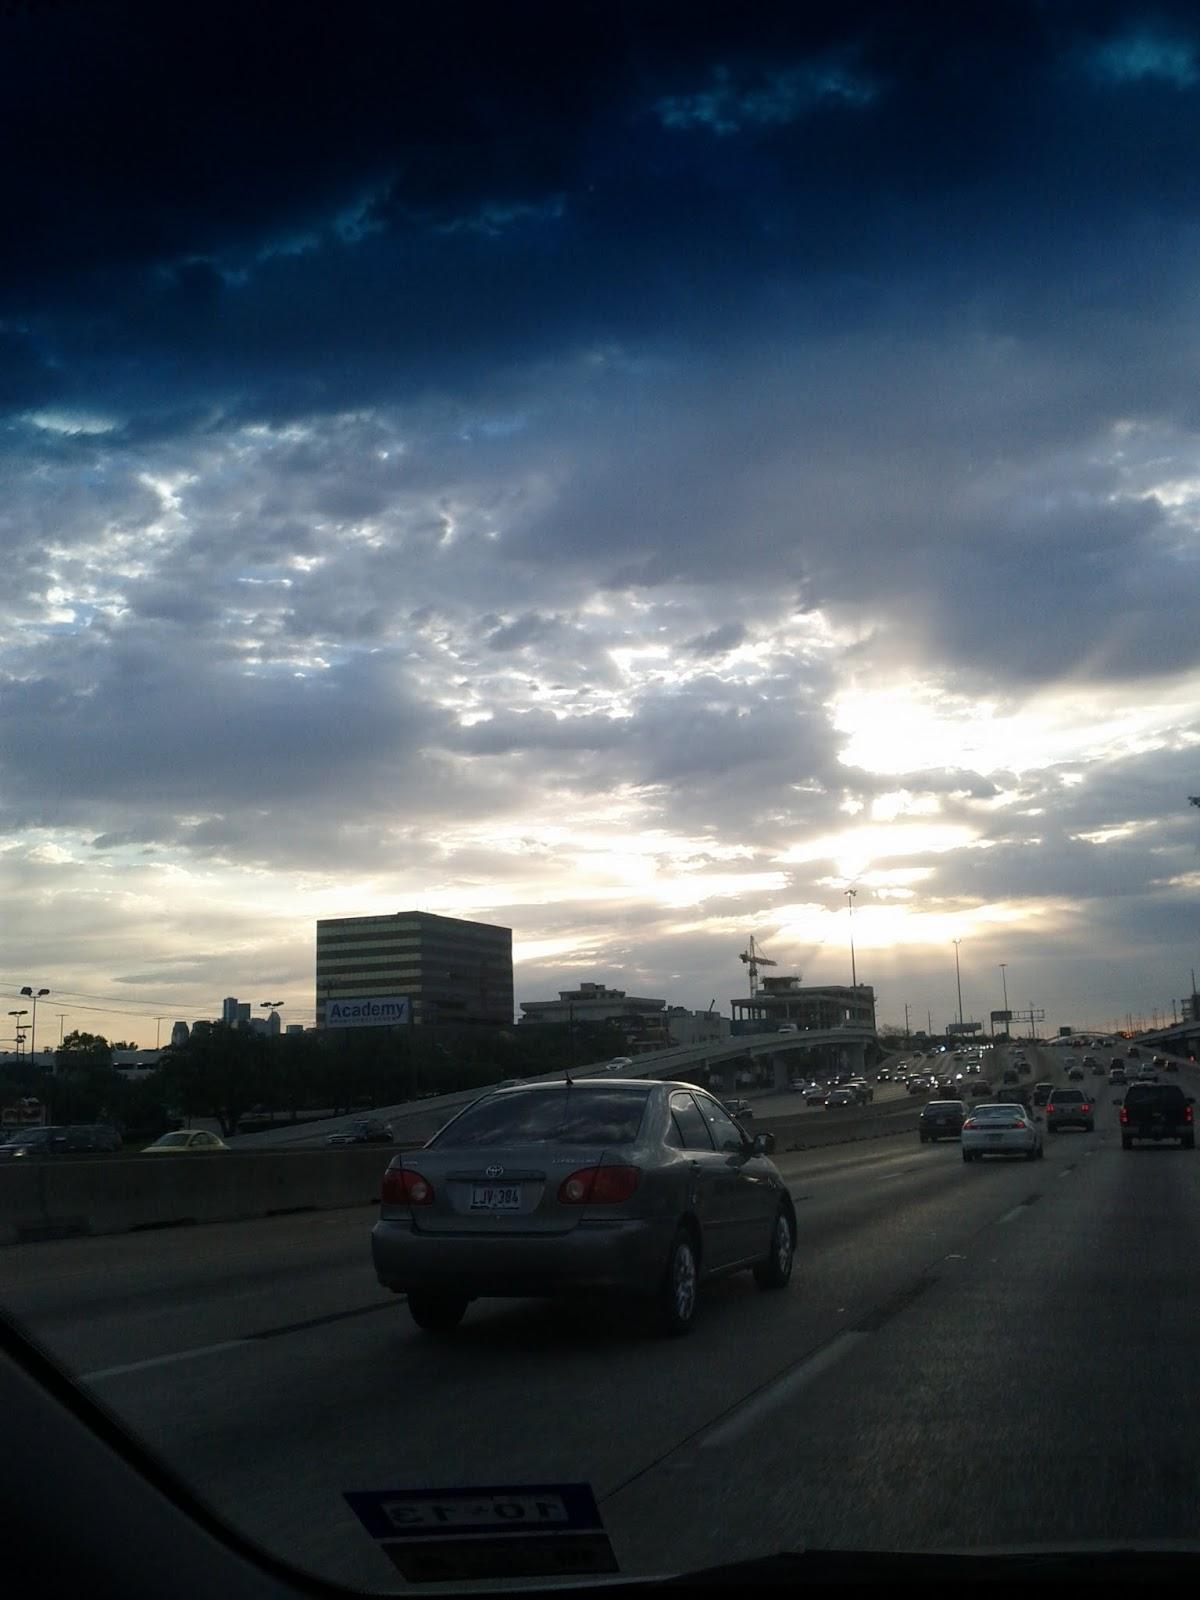 Sky - IMG_20130419_072359.jpg